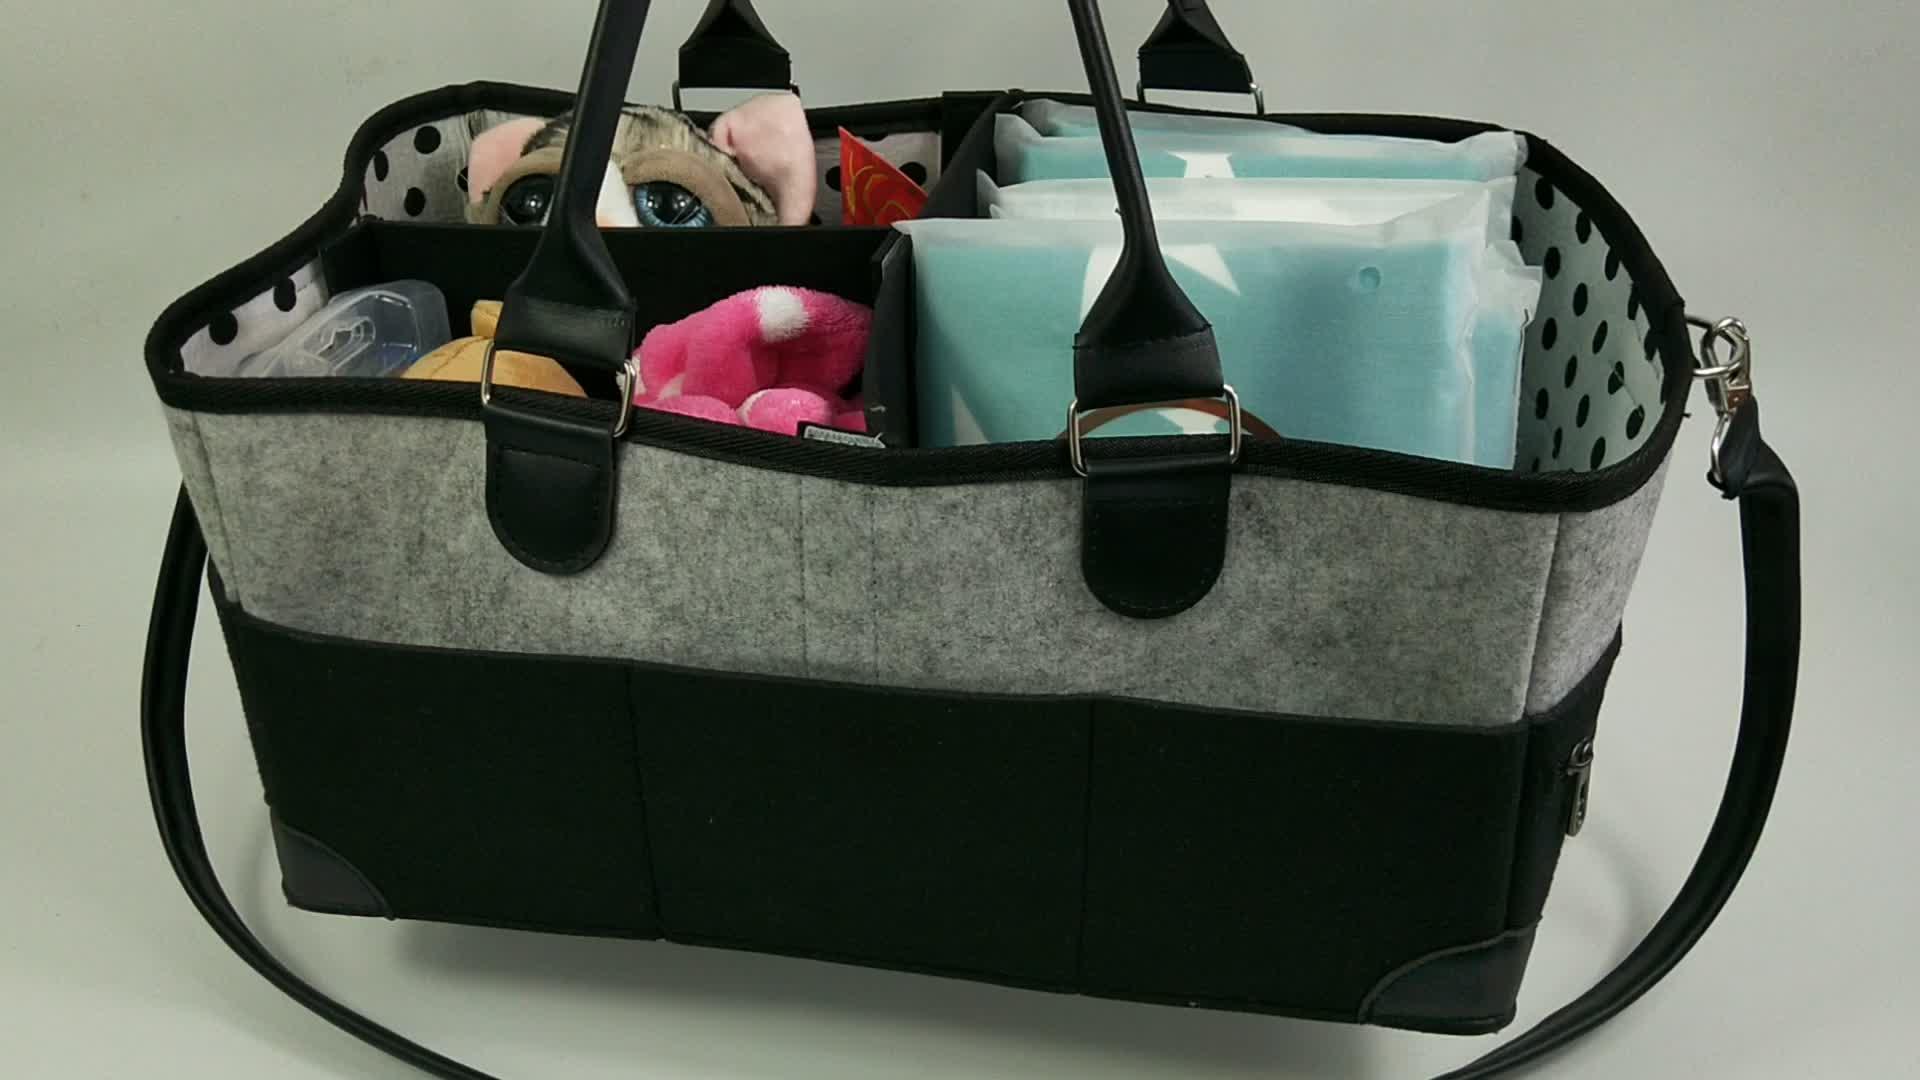 Polyester Felt Material Diaper Caddy Organiser Baby Nappy Storage Nursery Bin Felt Basket Wipes Bag